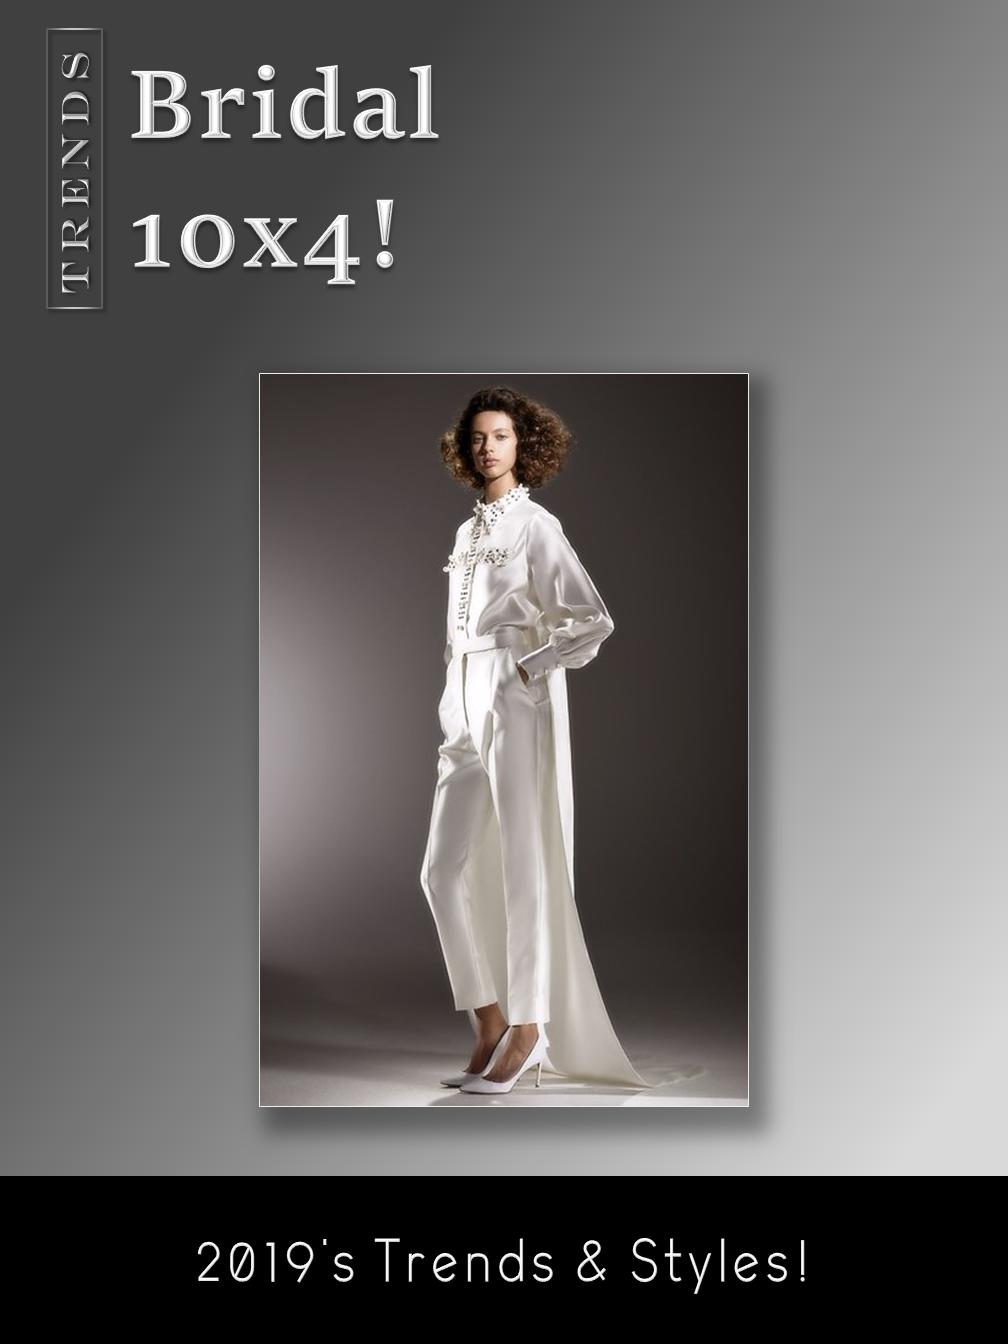 Bridal 10x4